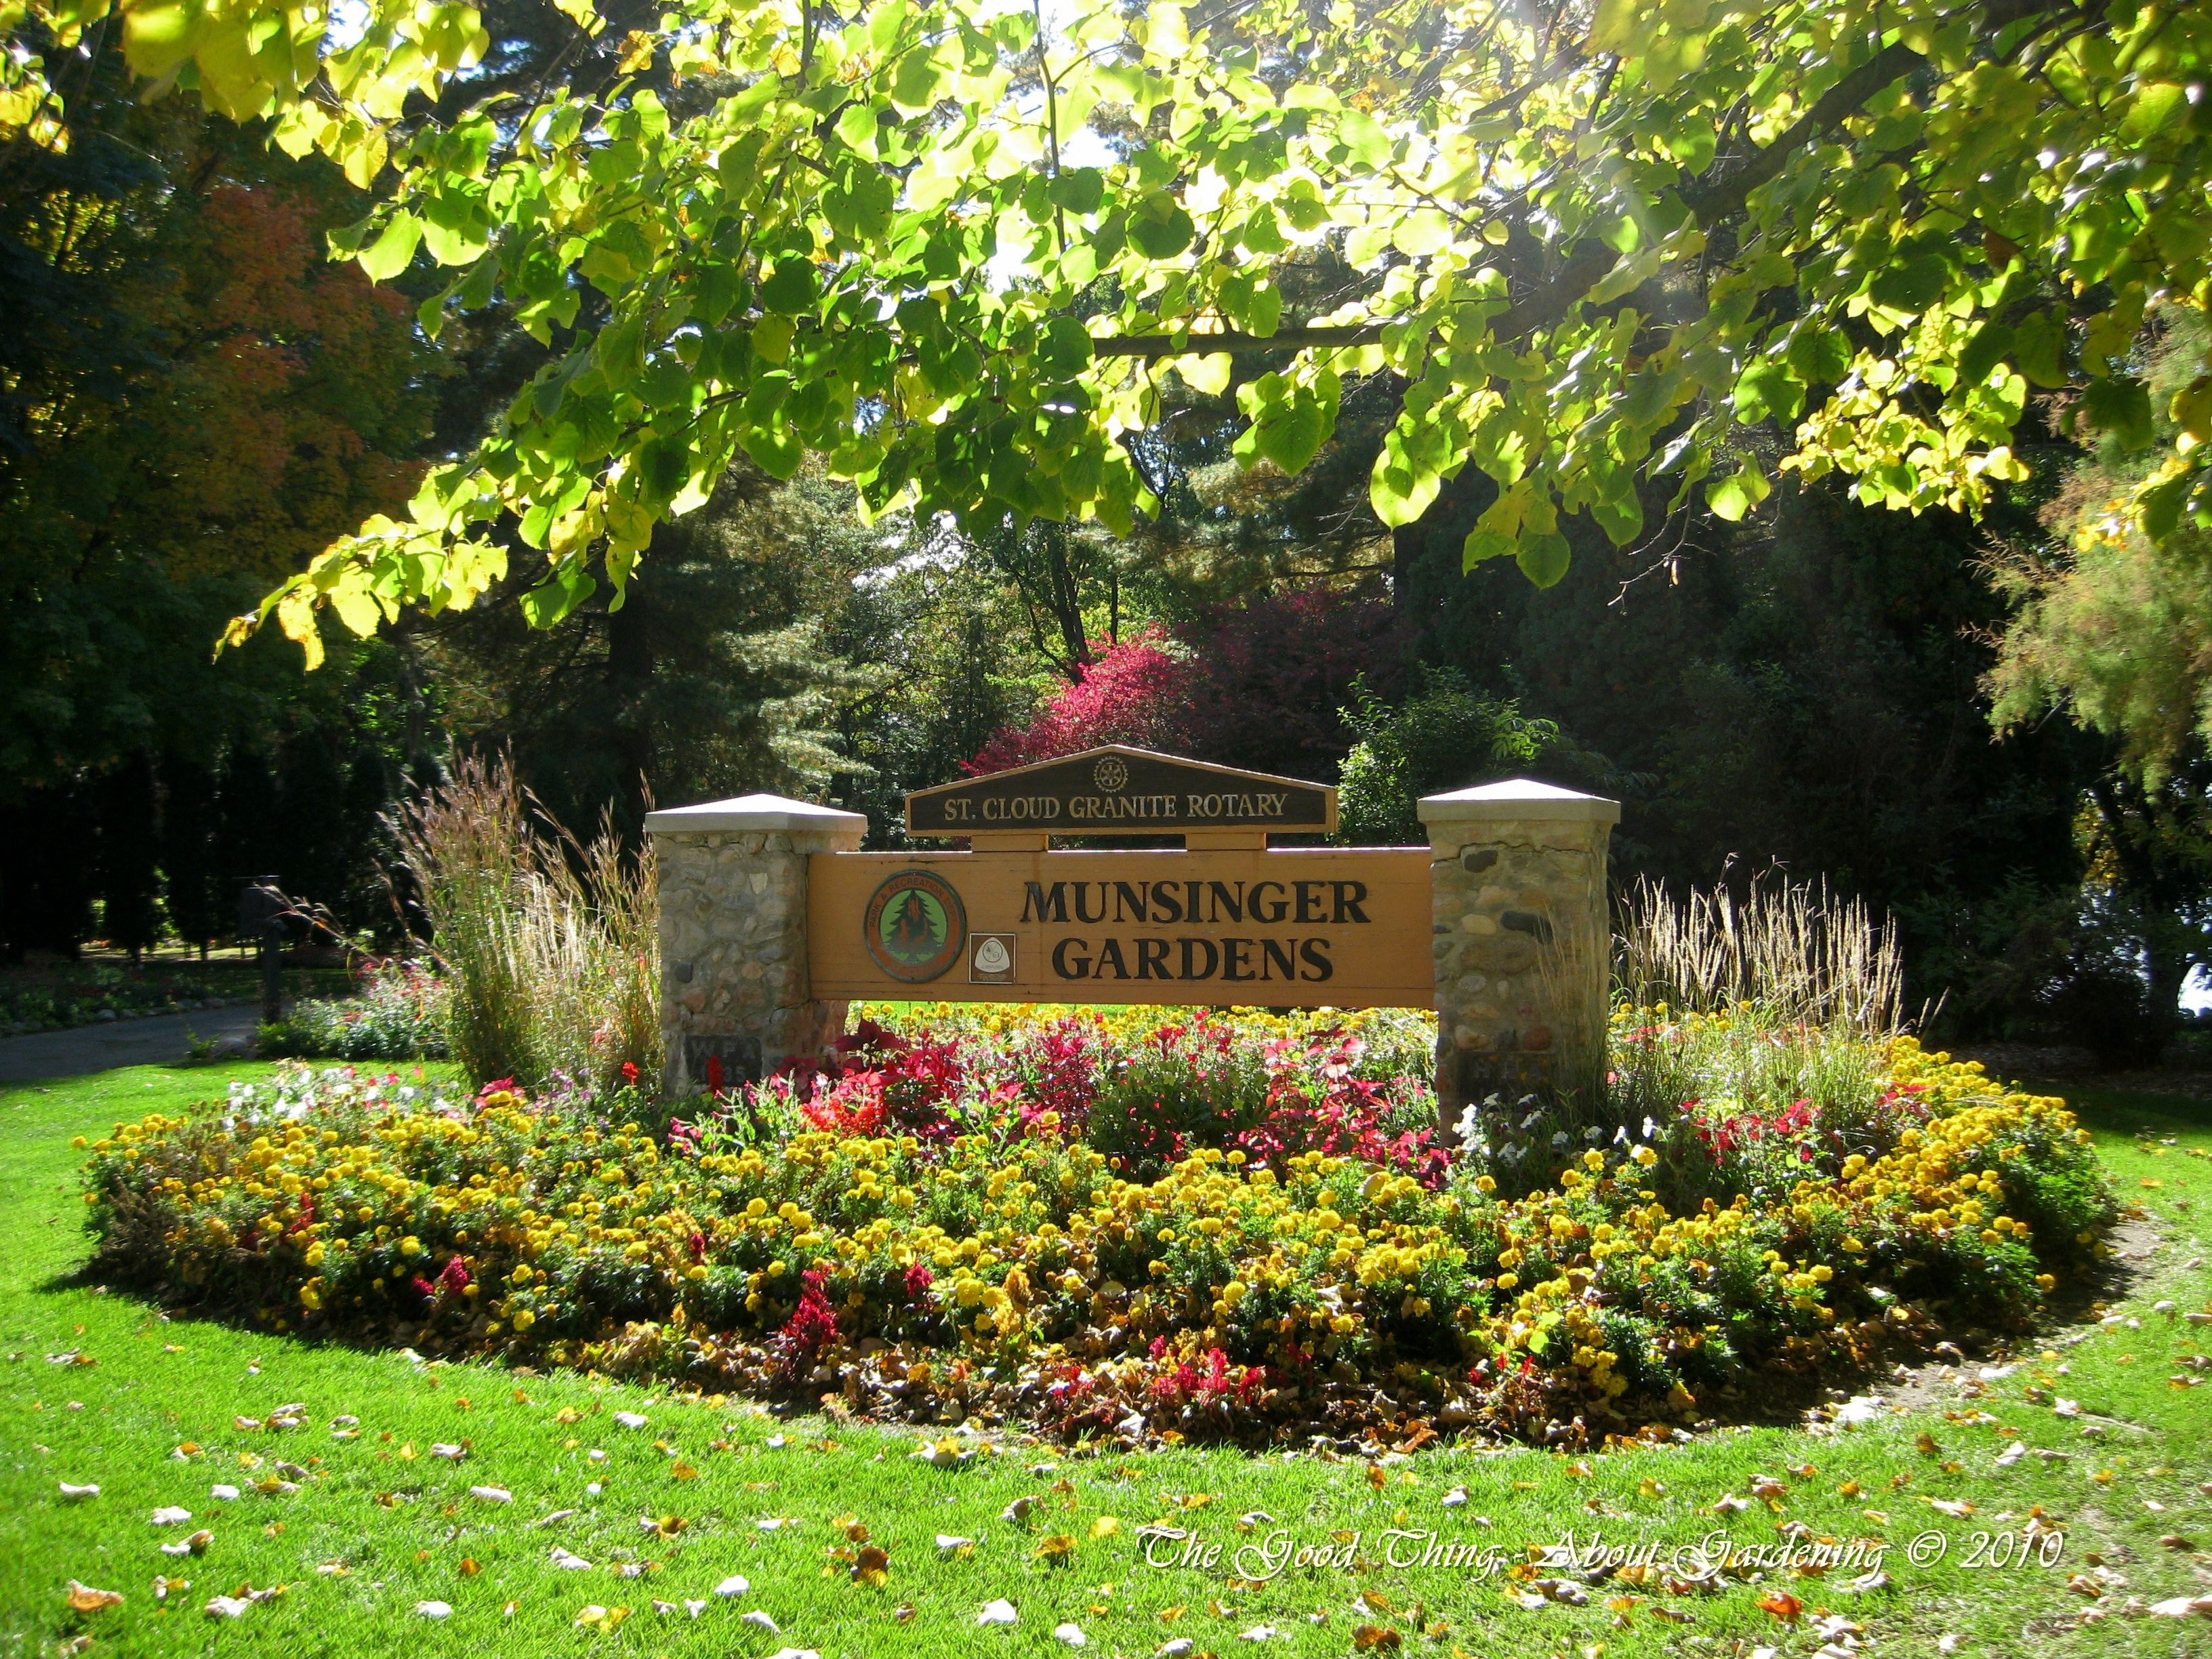 e163bc71b7480013c39f74d49004ecce - Best Time To Visit Munsinger Gardens